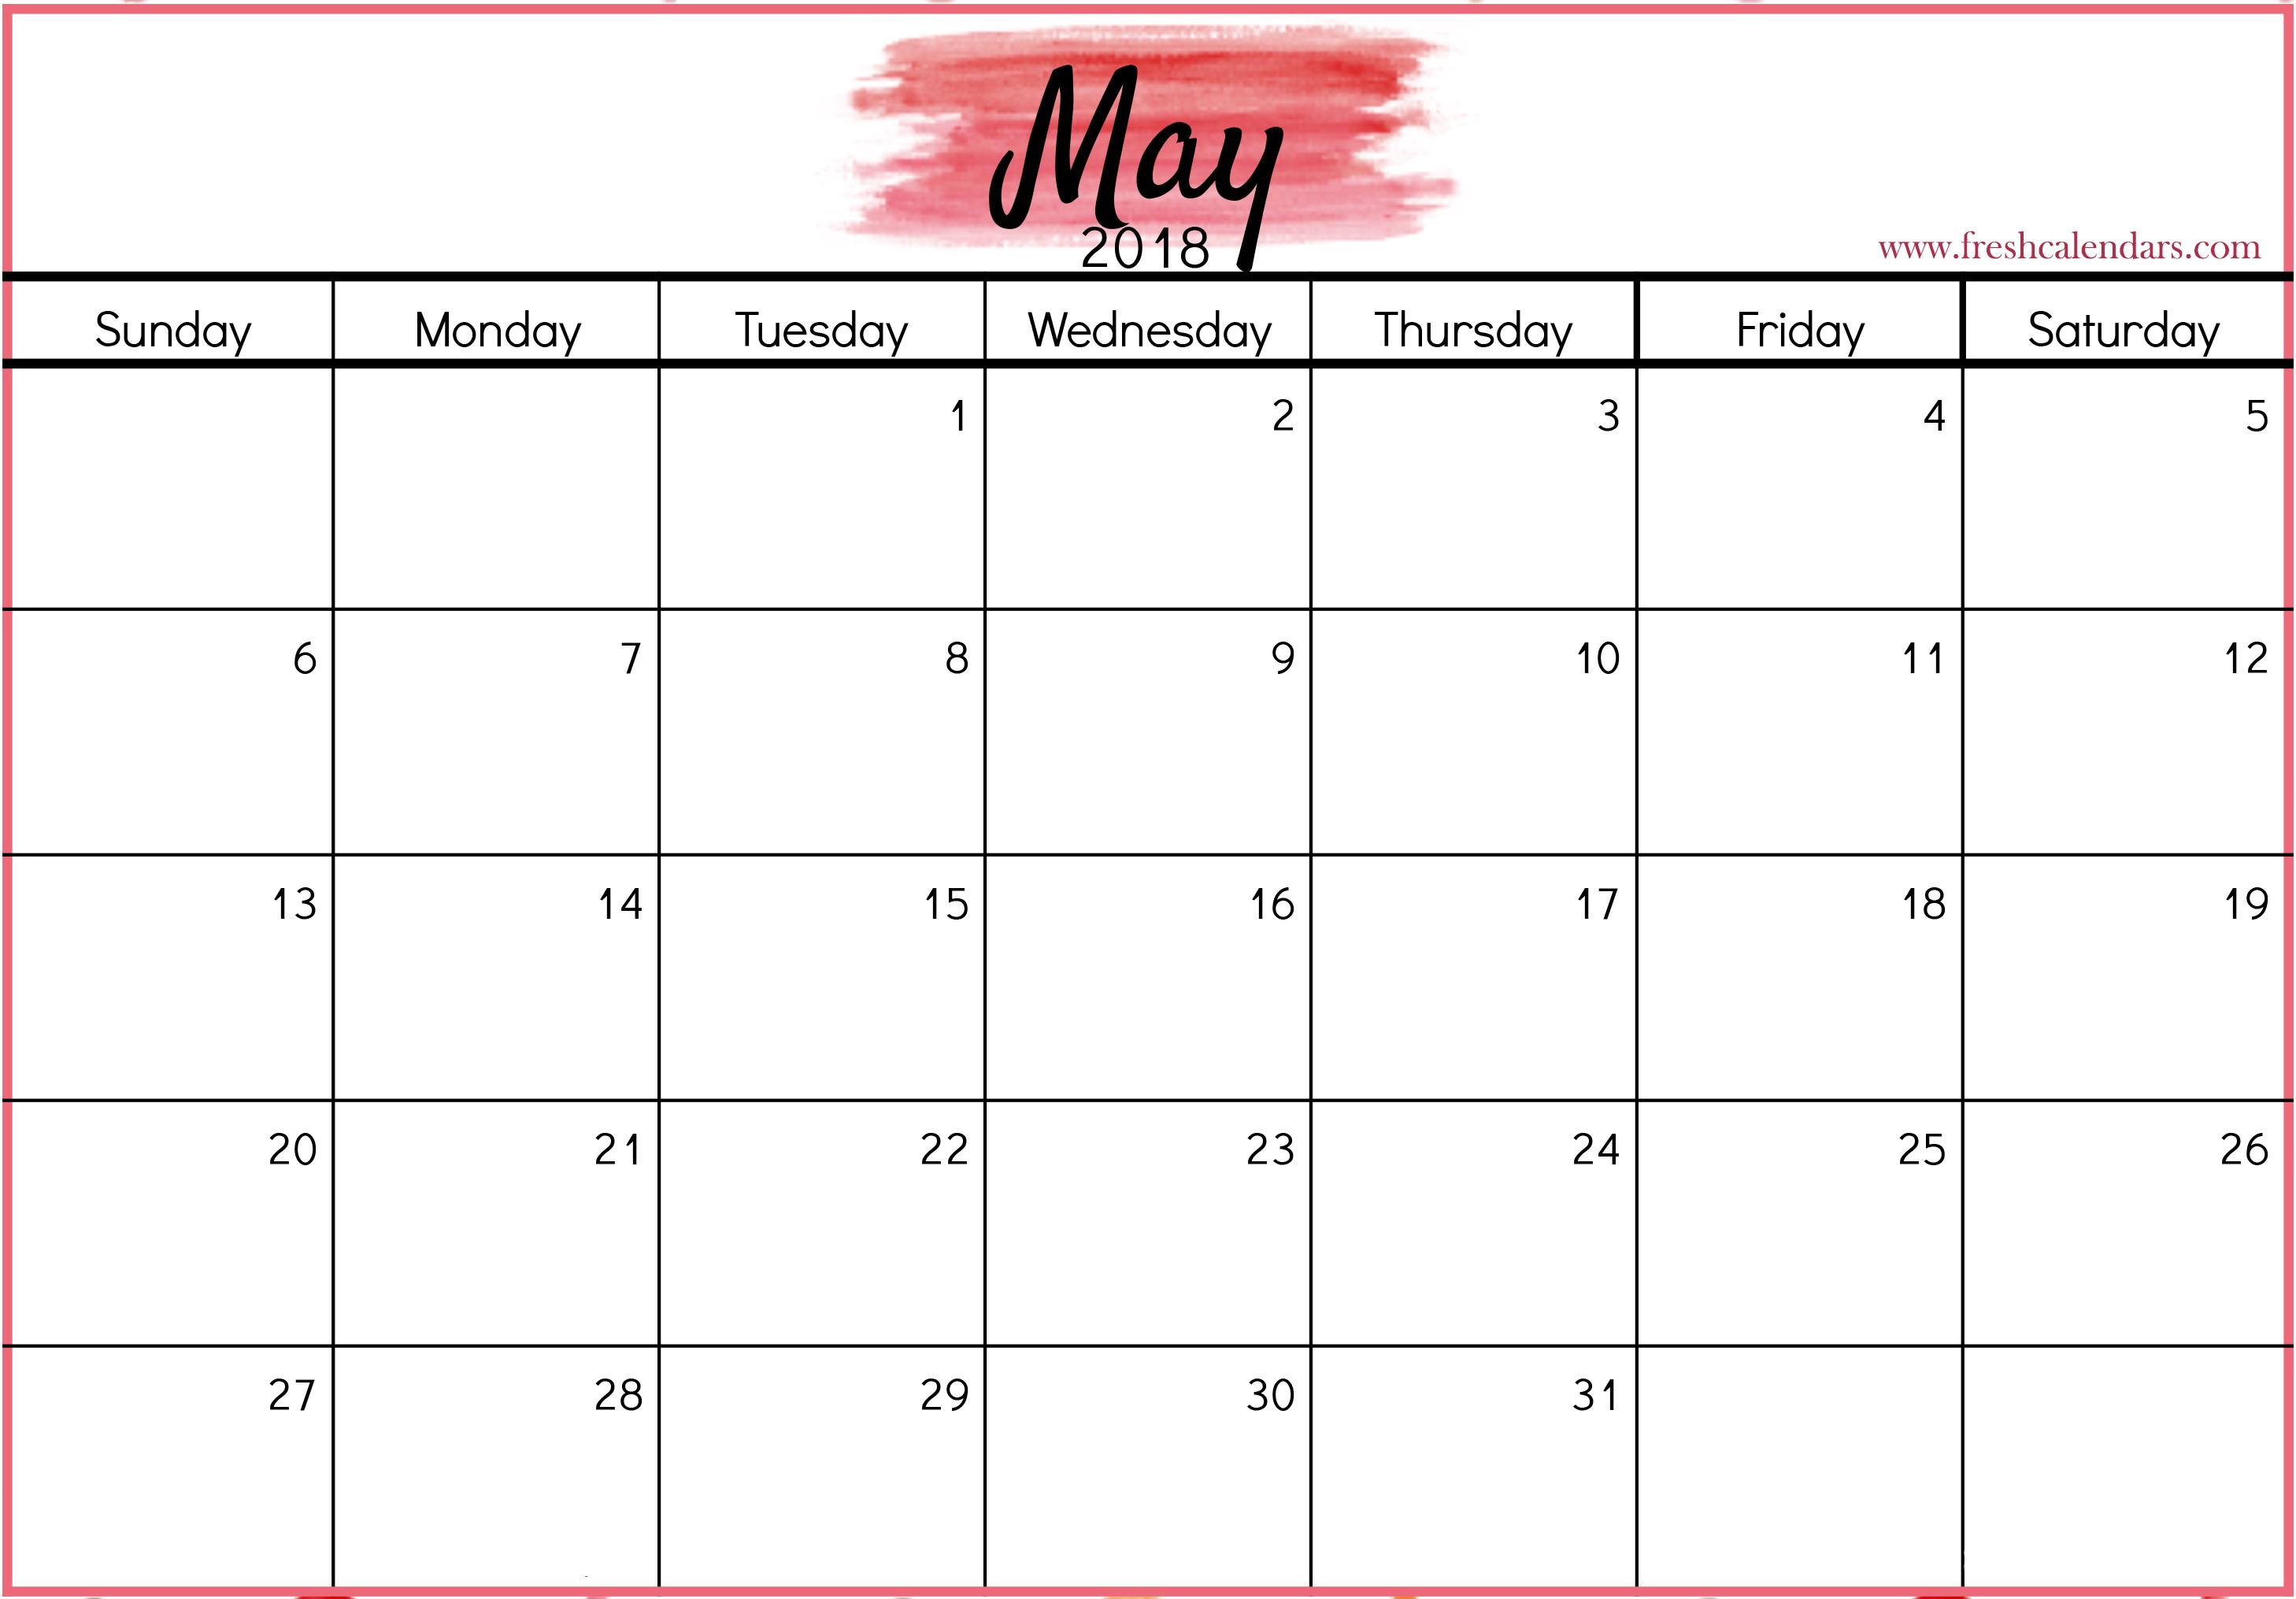 Calendar May 2018 Landscape